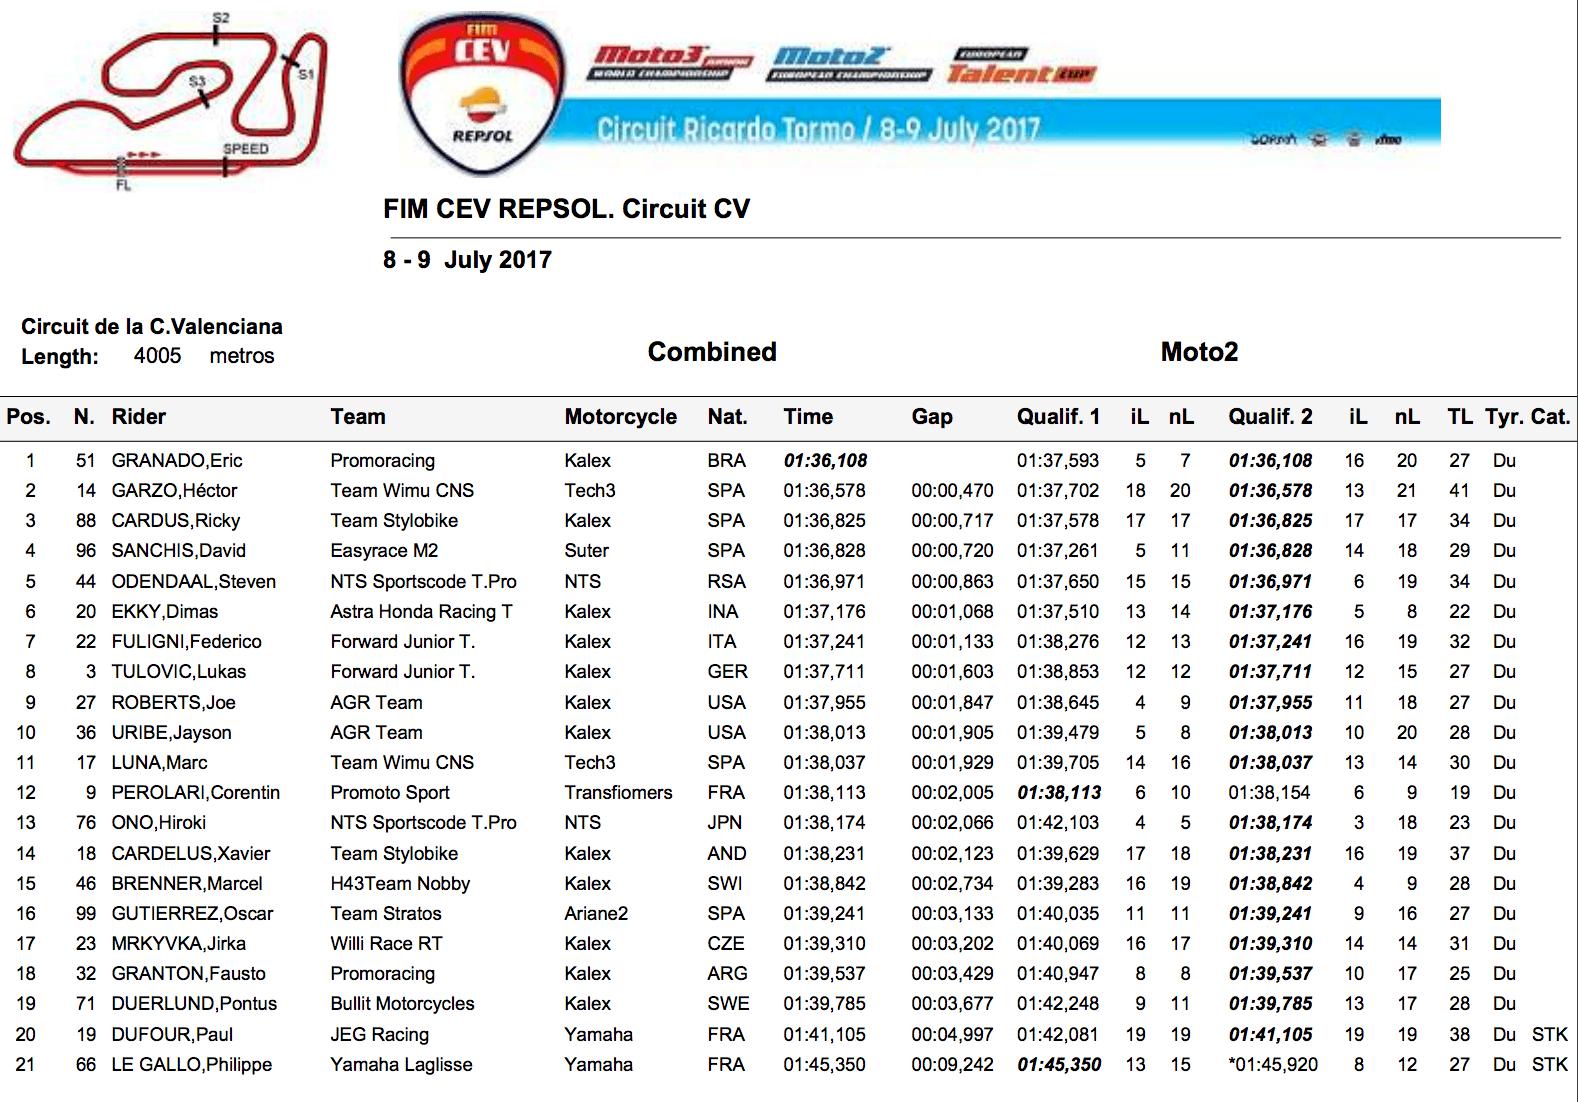 ★CEV Repsol 2017バレンシア戦 Moto2クラス予選総合結果